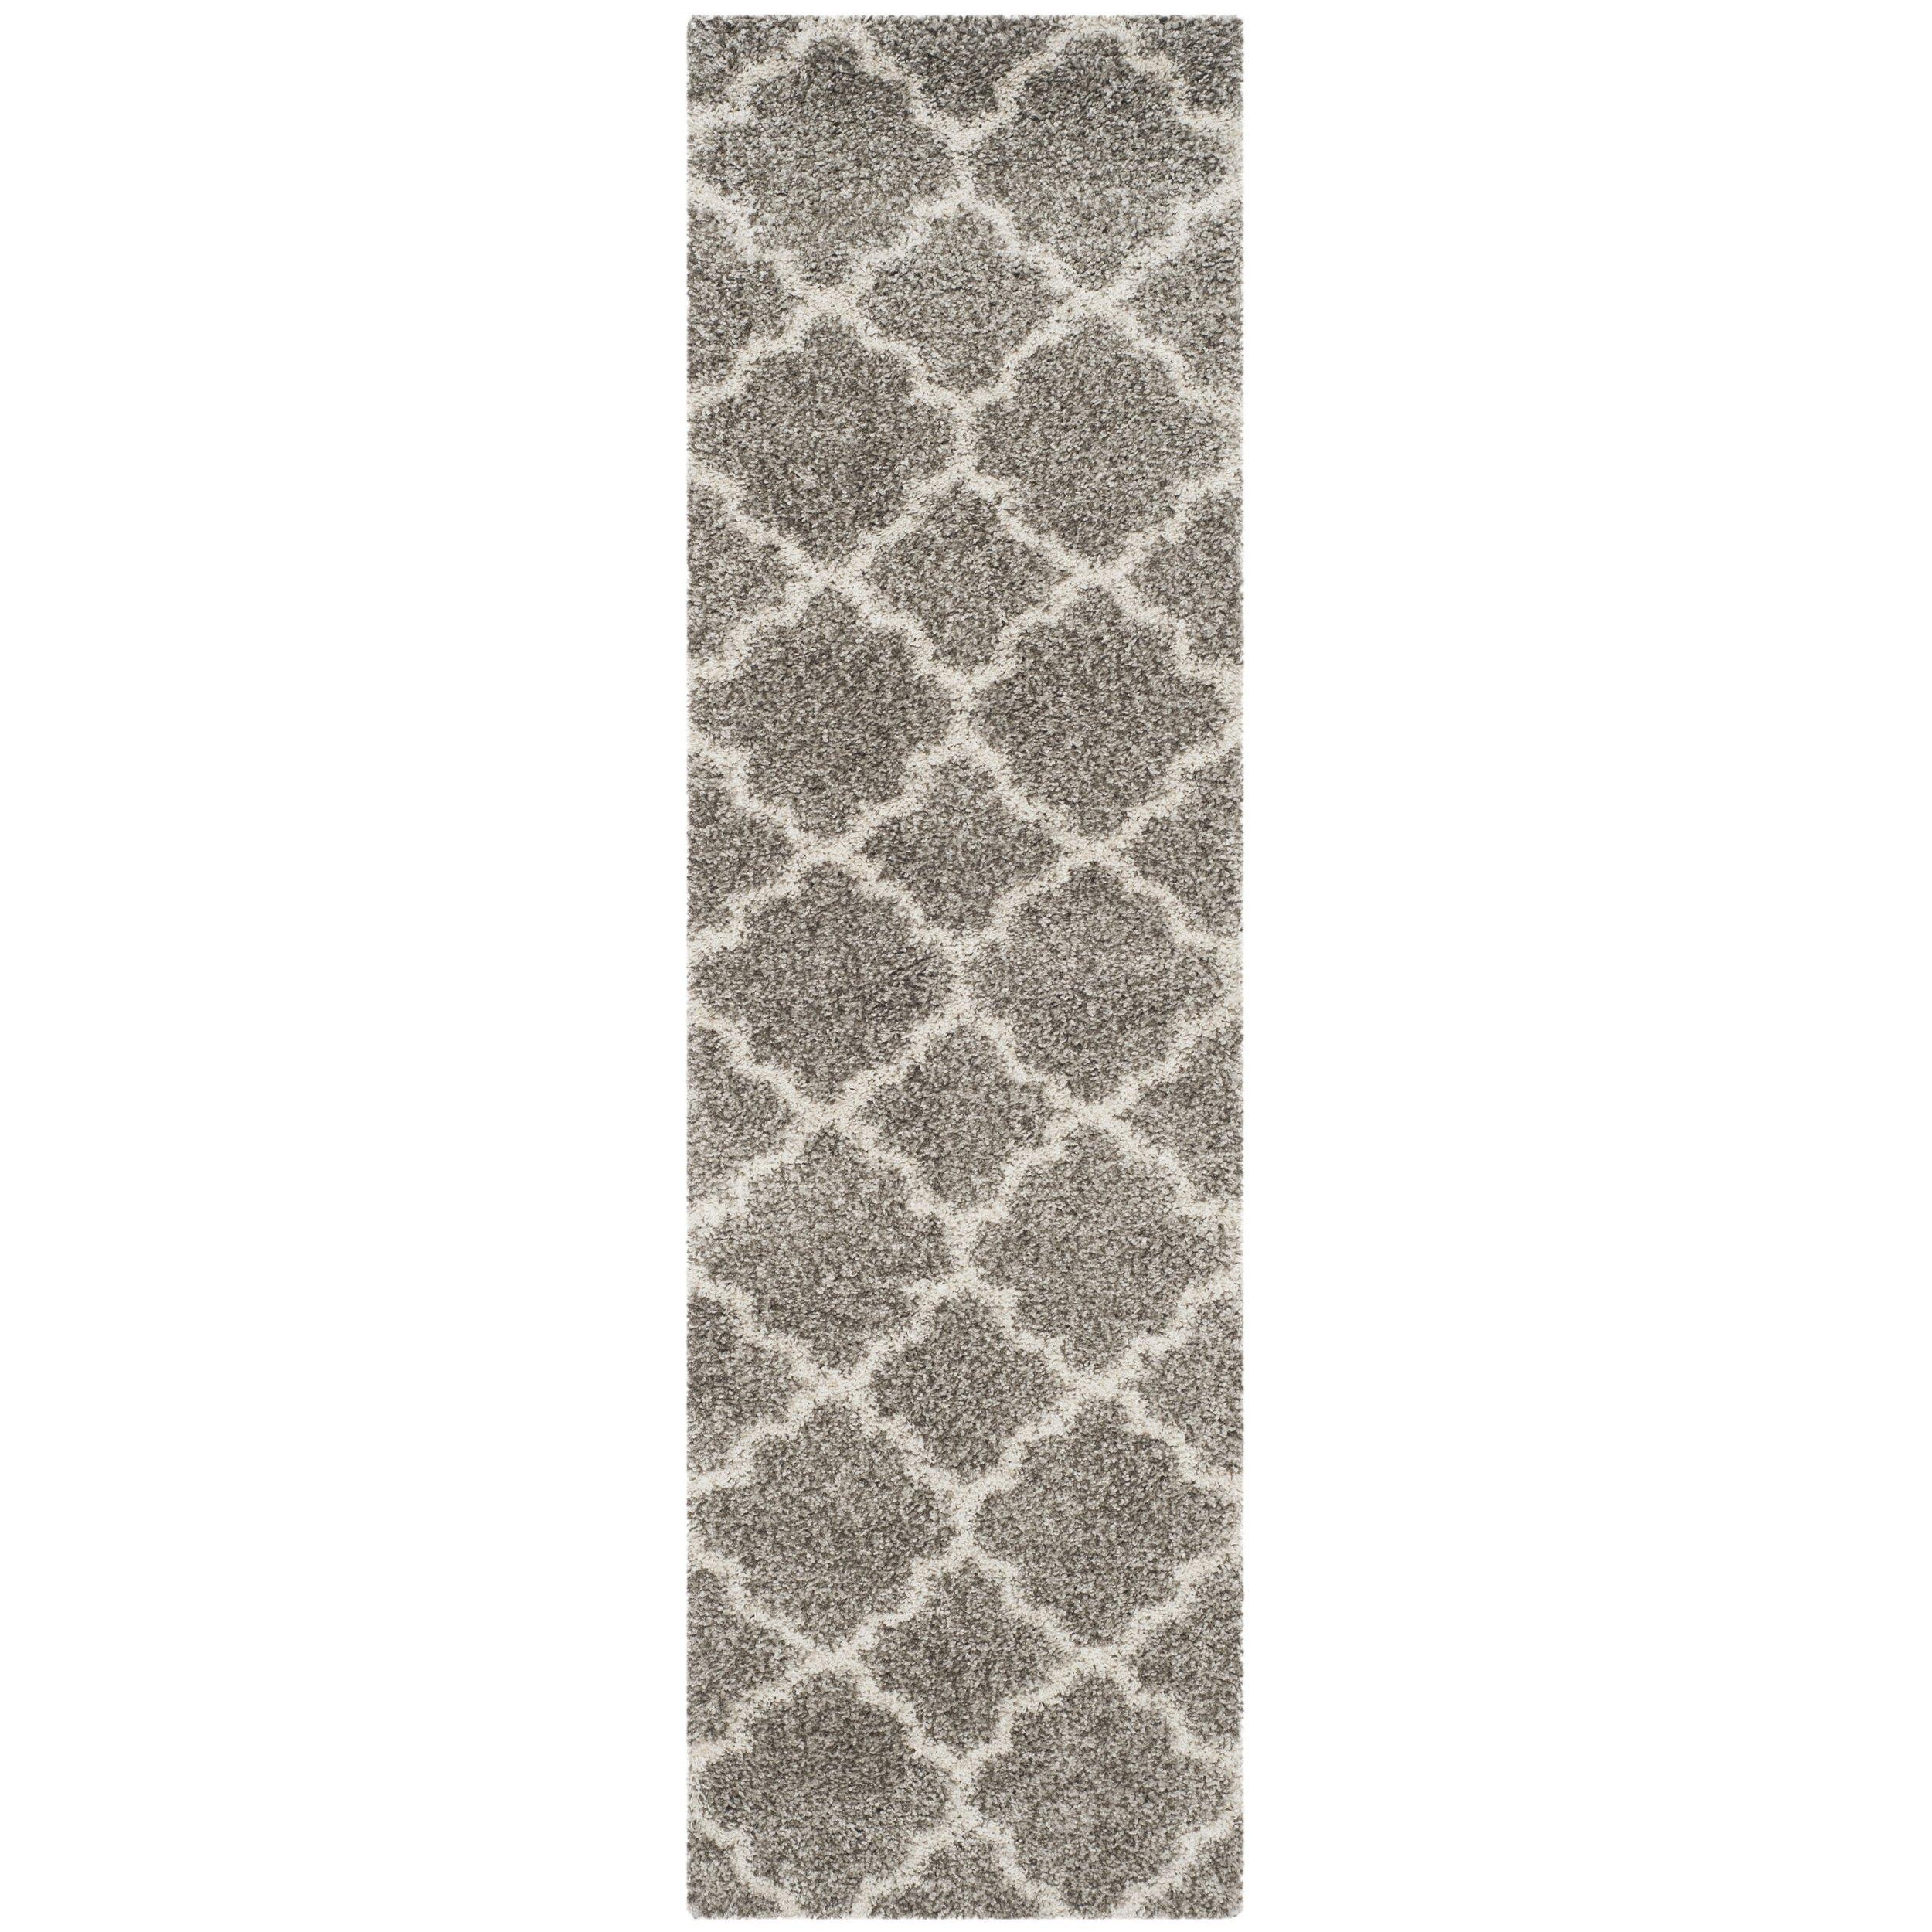 Safavieh Hudson Shag Collection SGH282B Grey and Ivory Runner, 2'3'' x 14' by Safavieh